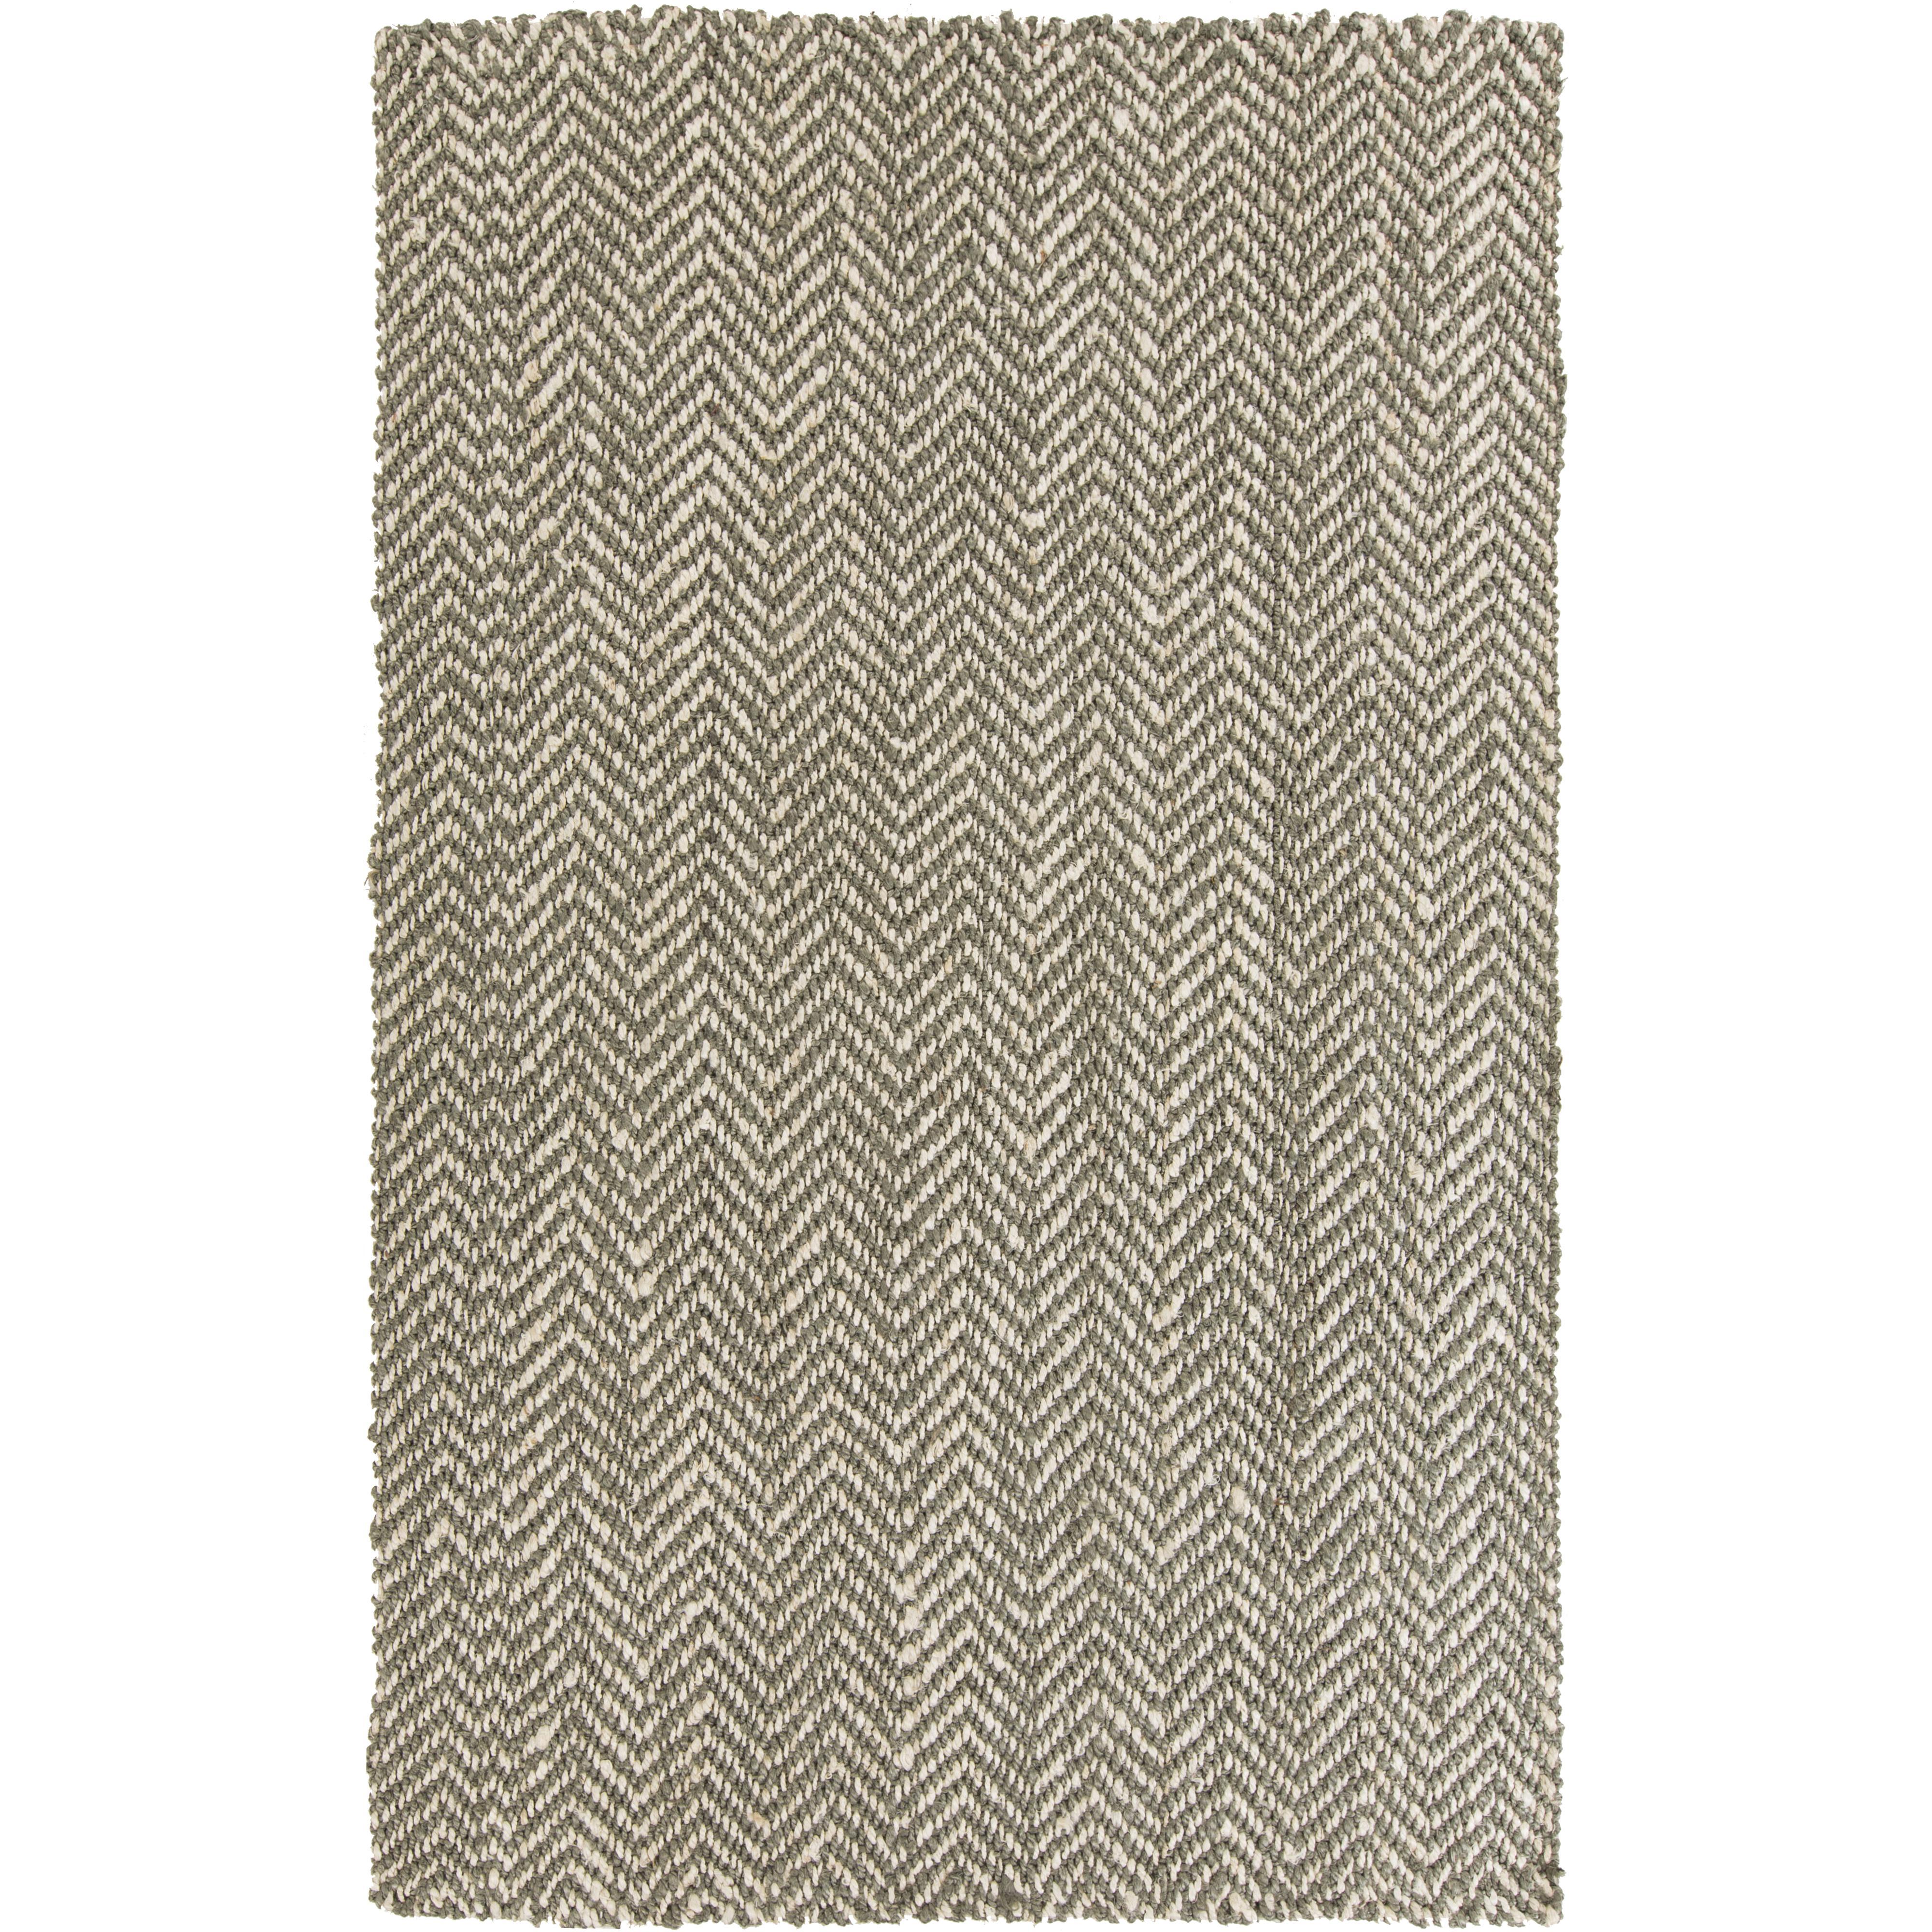 Surya Reeds 10' x 14' - Item Number: REED800-1014